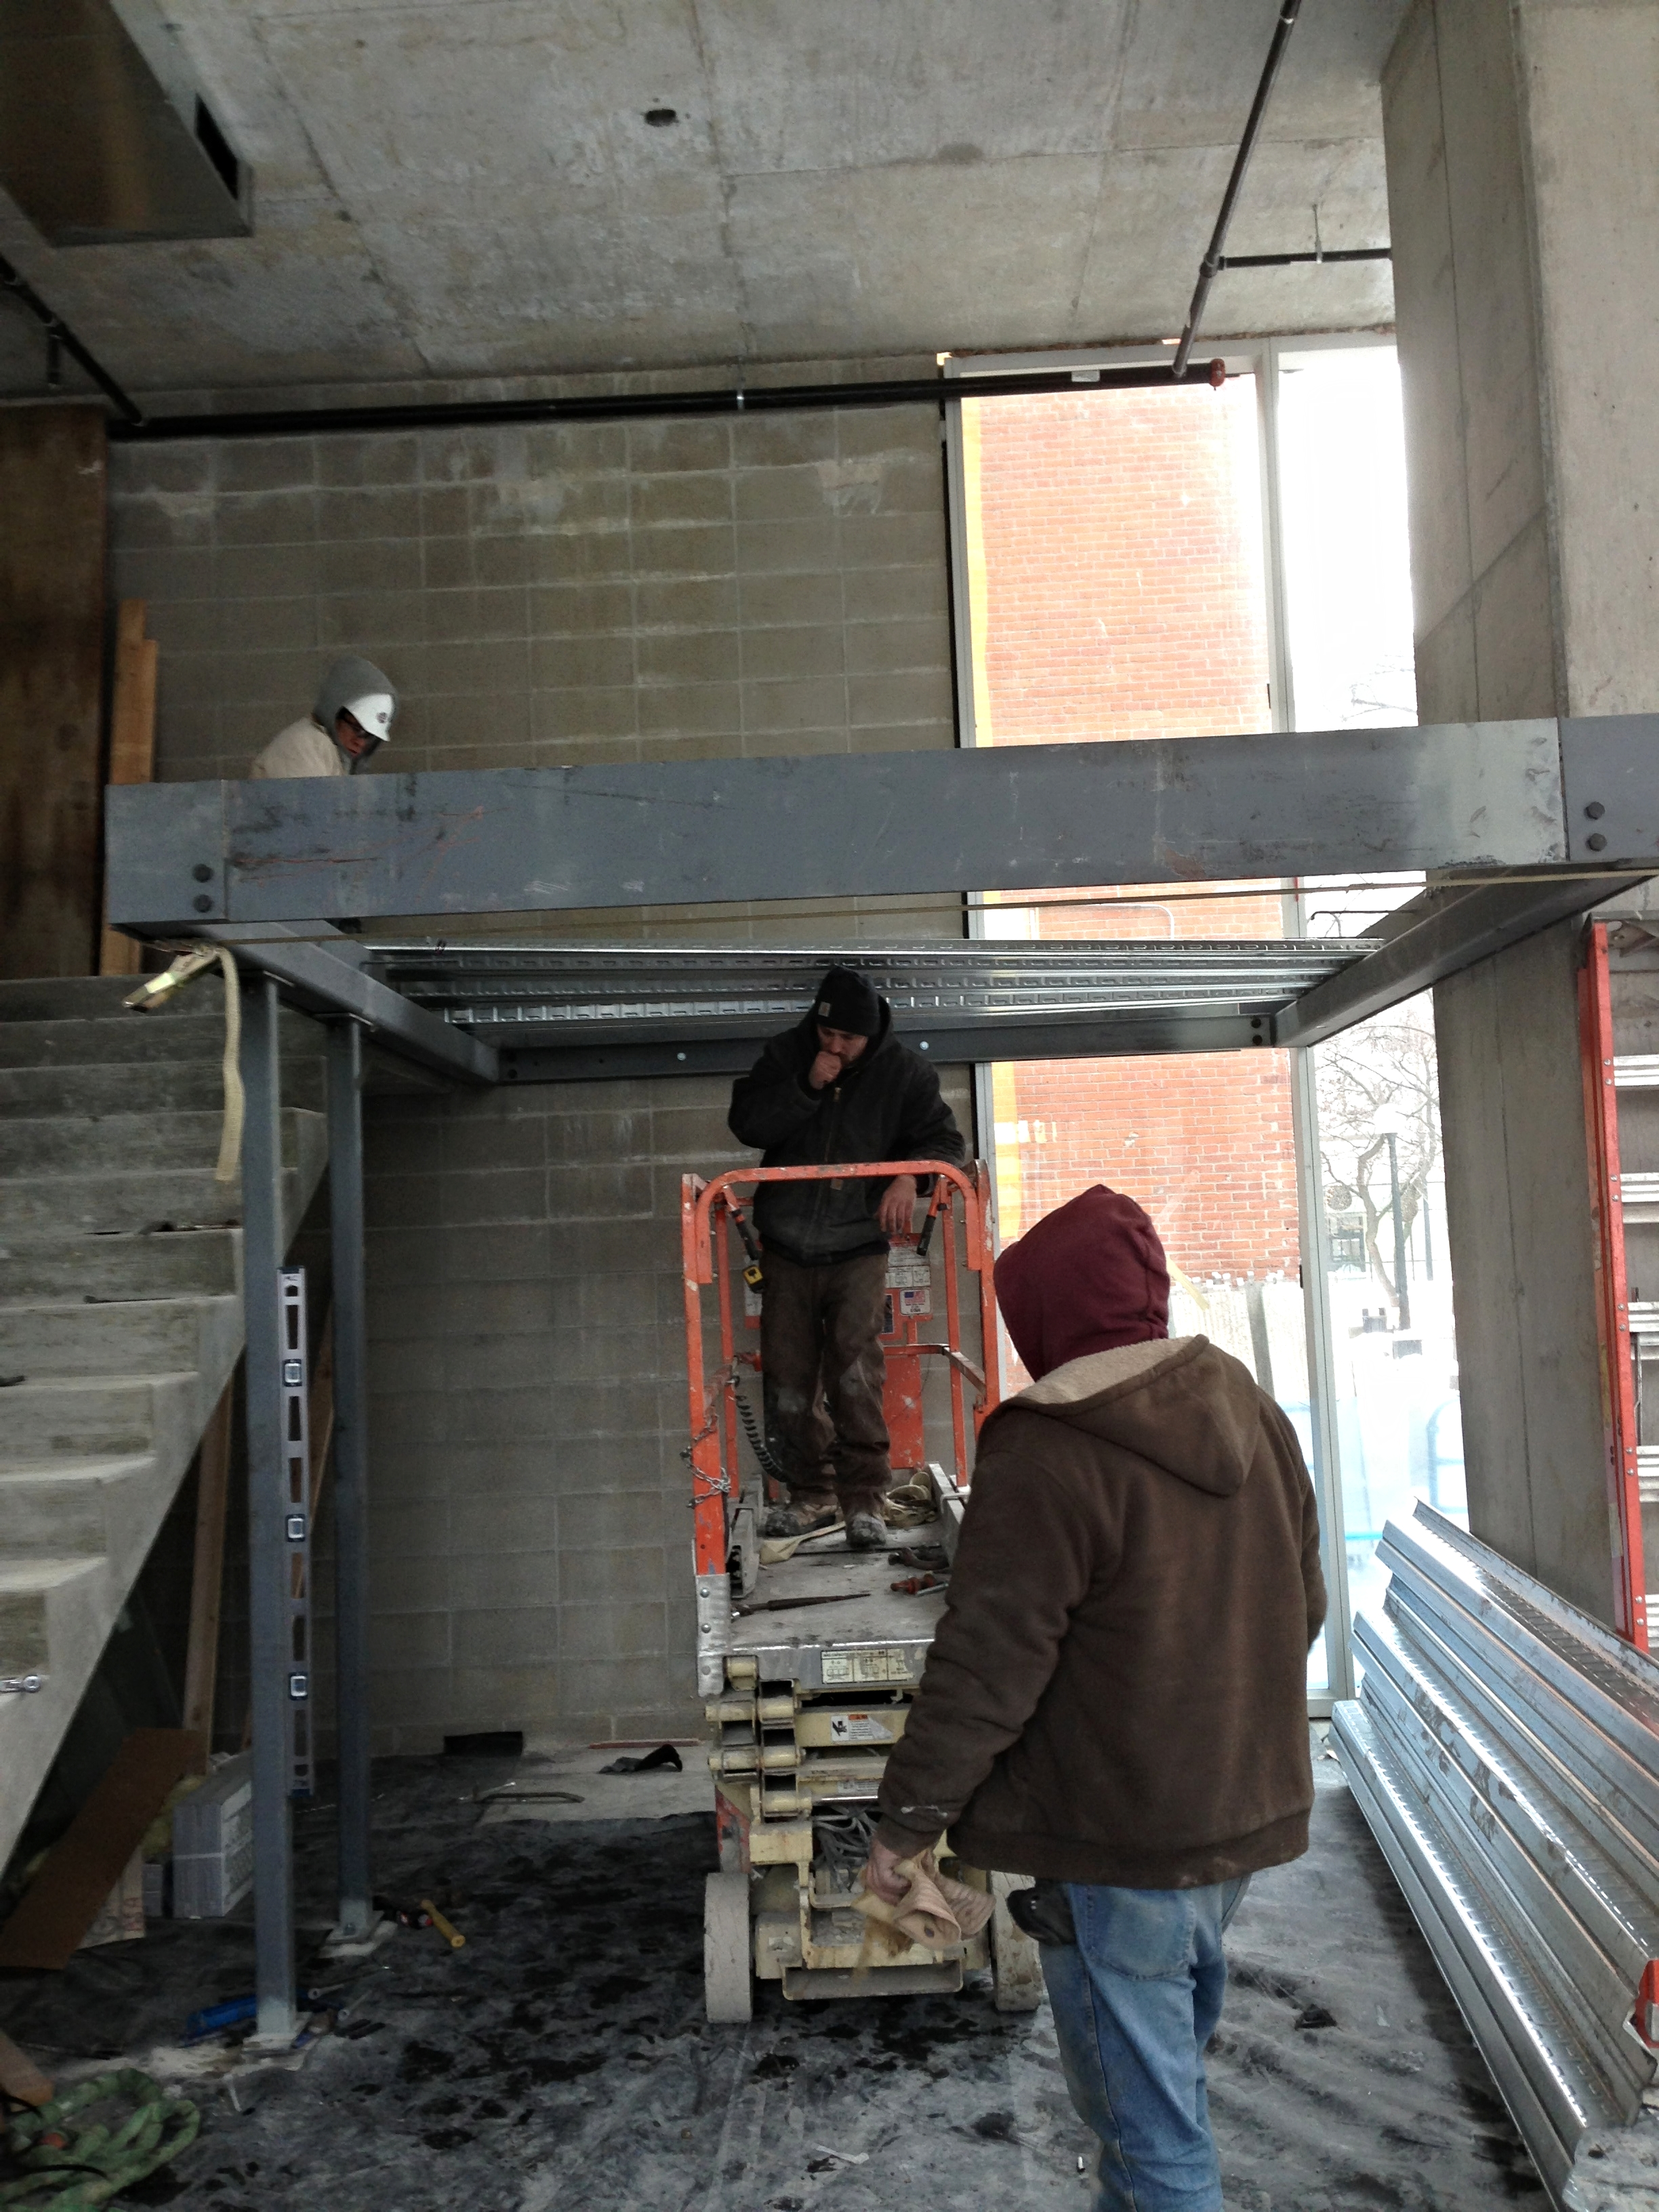 New Buzz Salon Iowa City Iowa under construction... owner Jodi Connolly